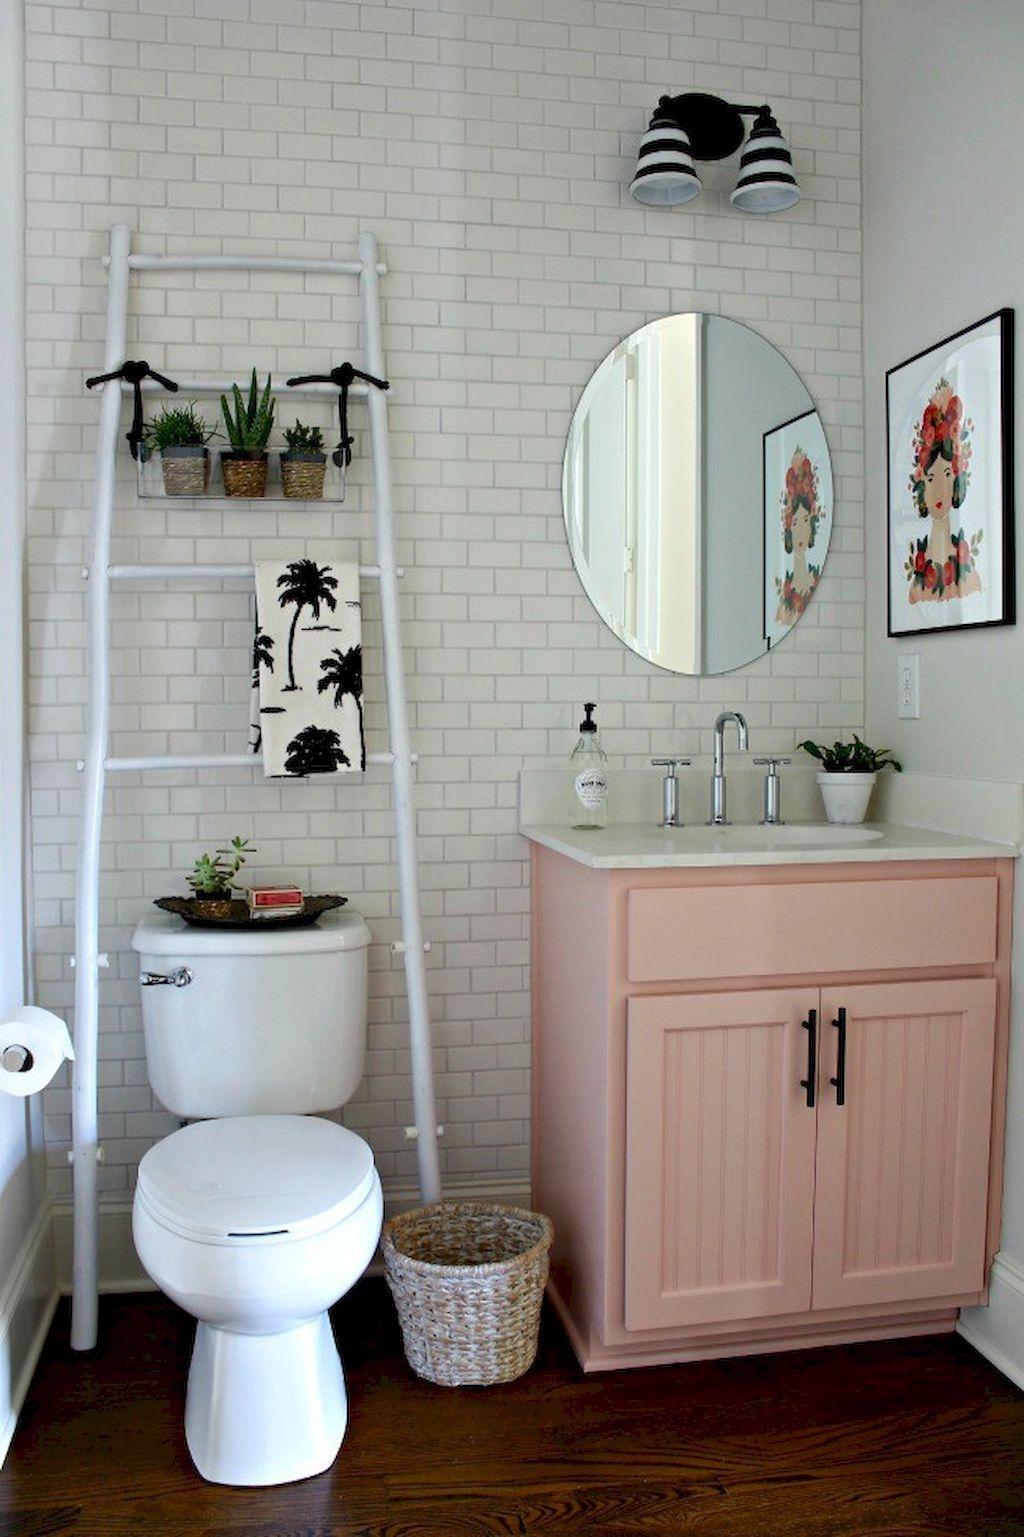 Brilliant Small Apartment Decoration Ideas On A Budget 26